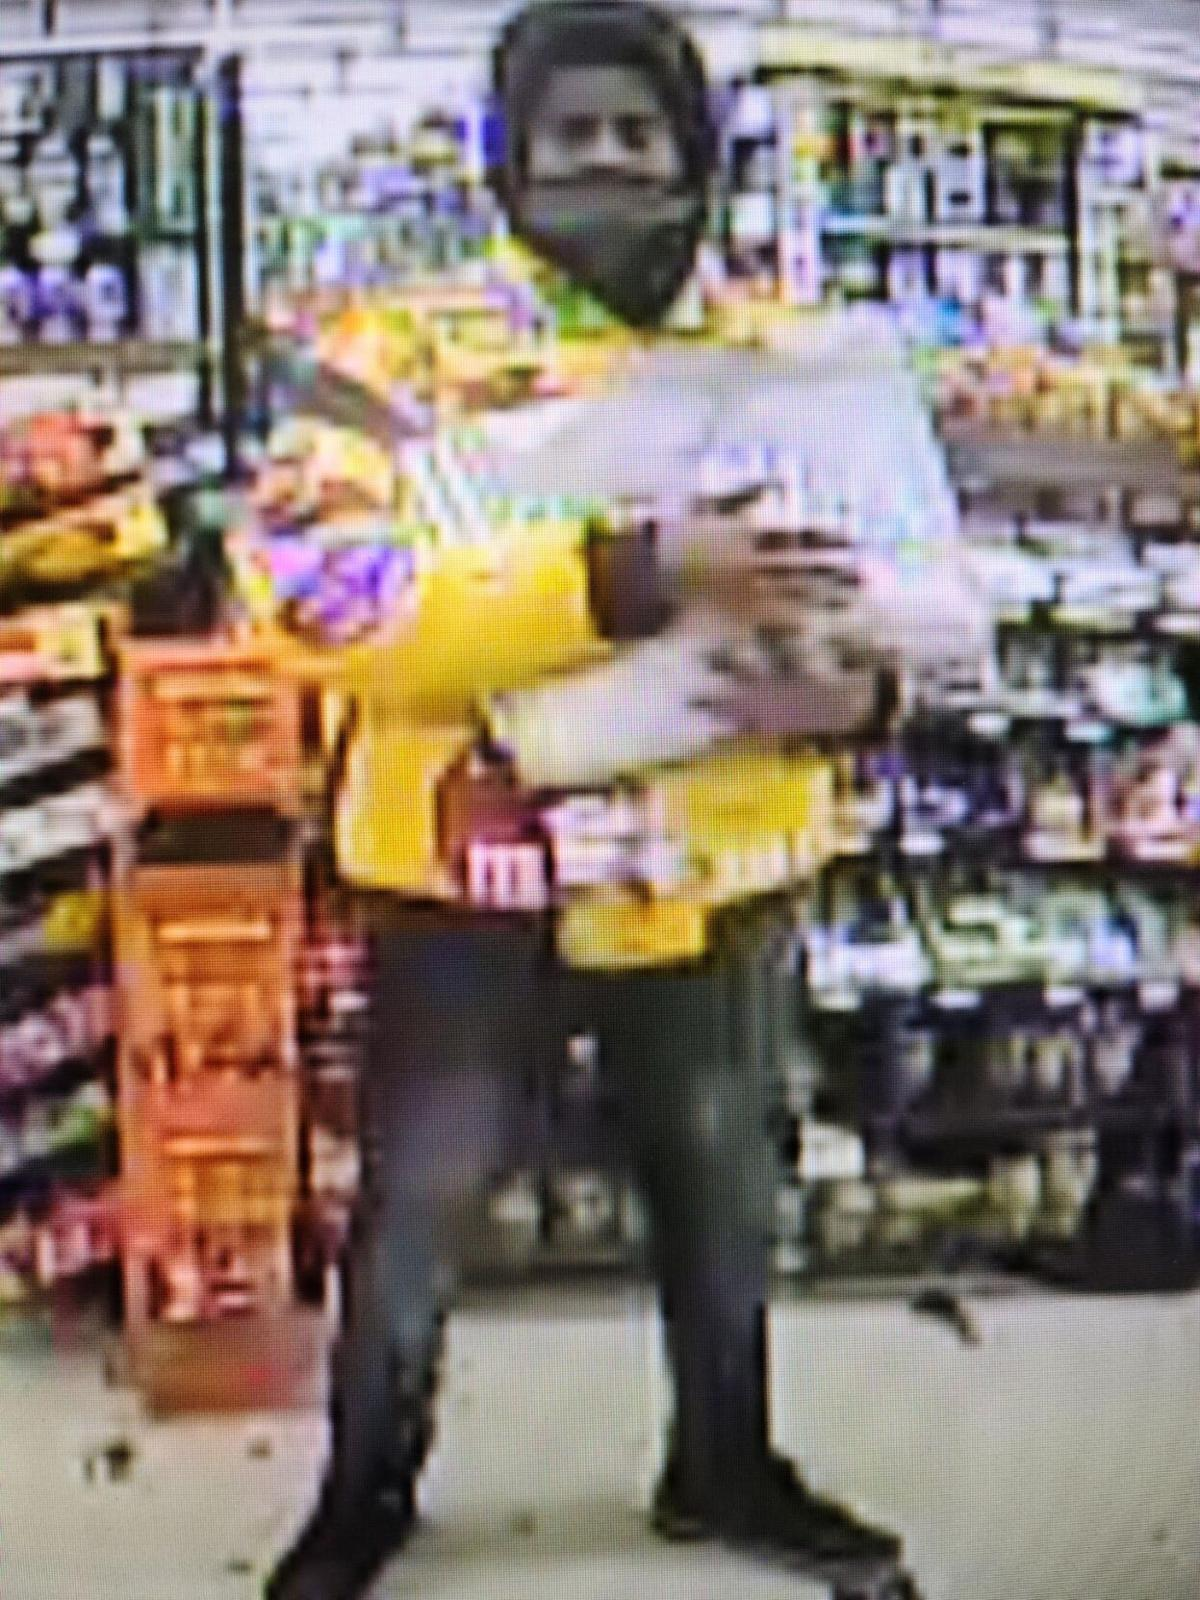 Dellwood DG robbery 1.JPG